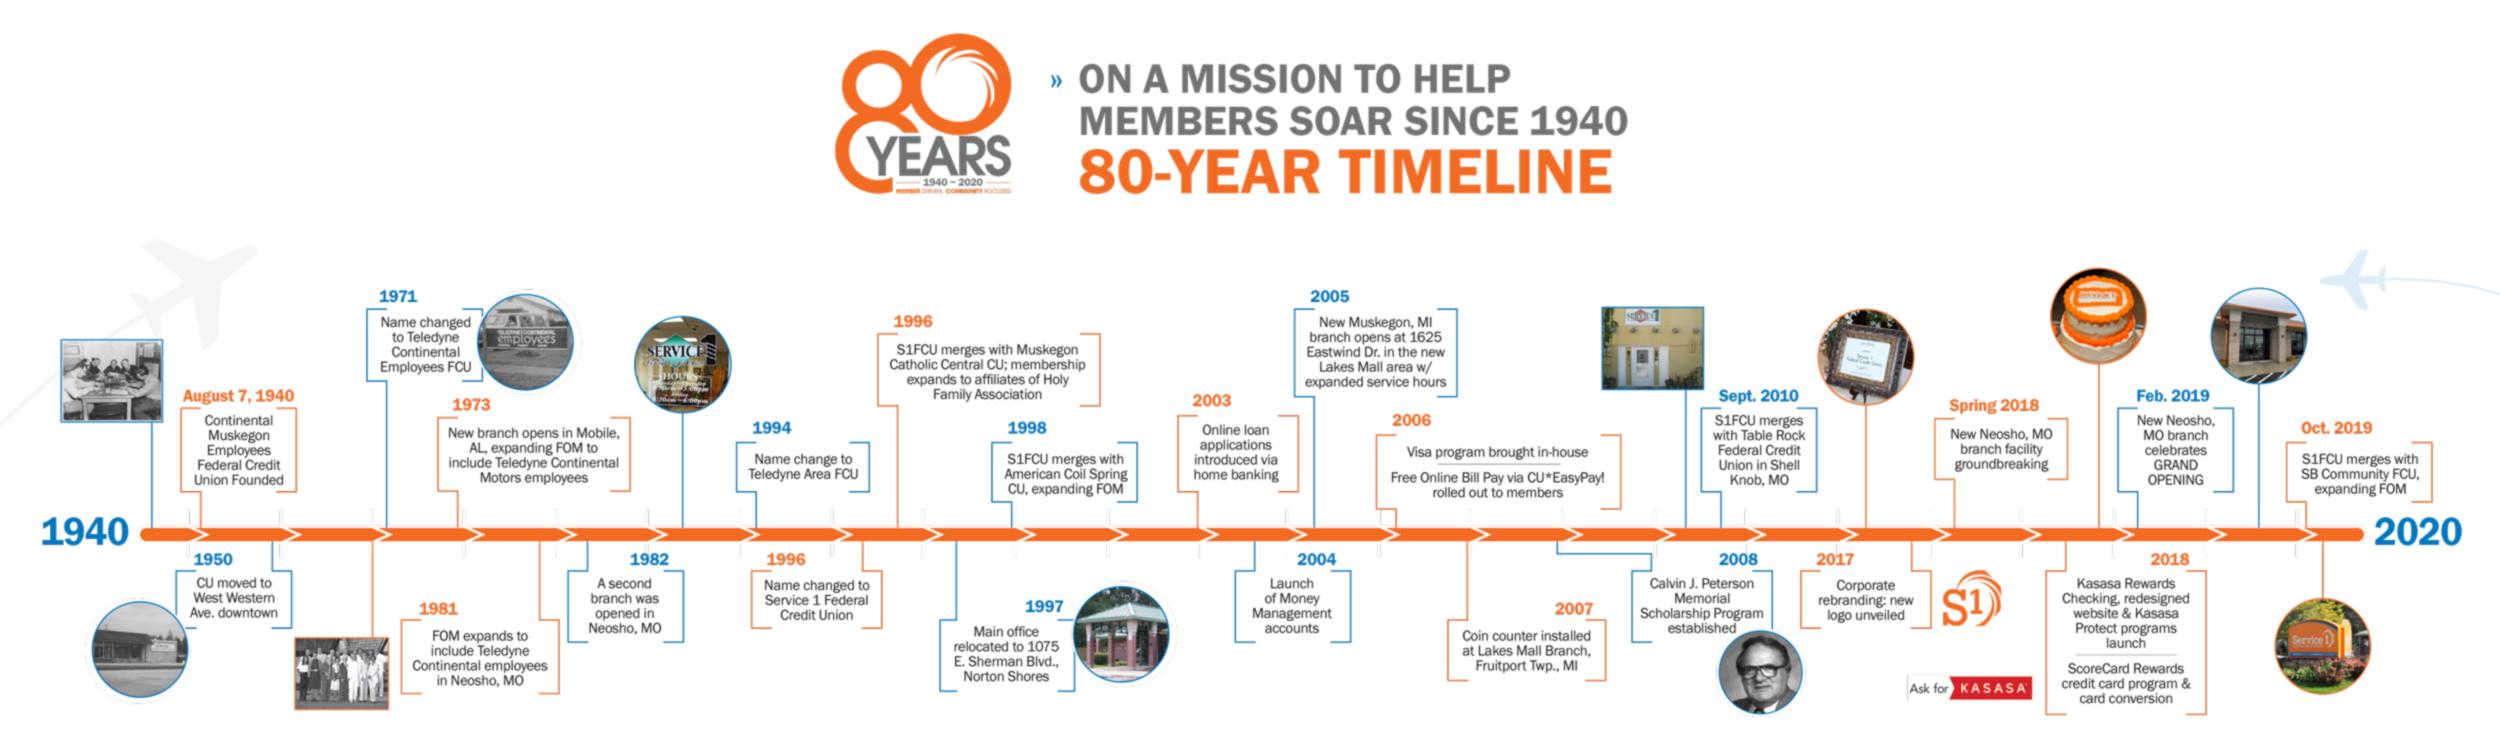 Service 1 FCU Historical Timeline